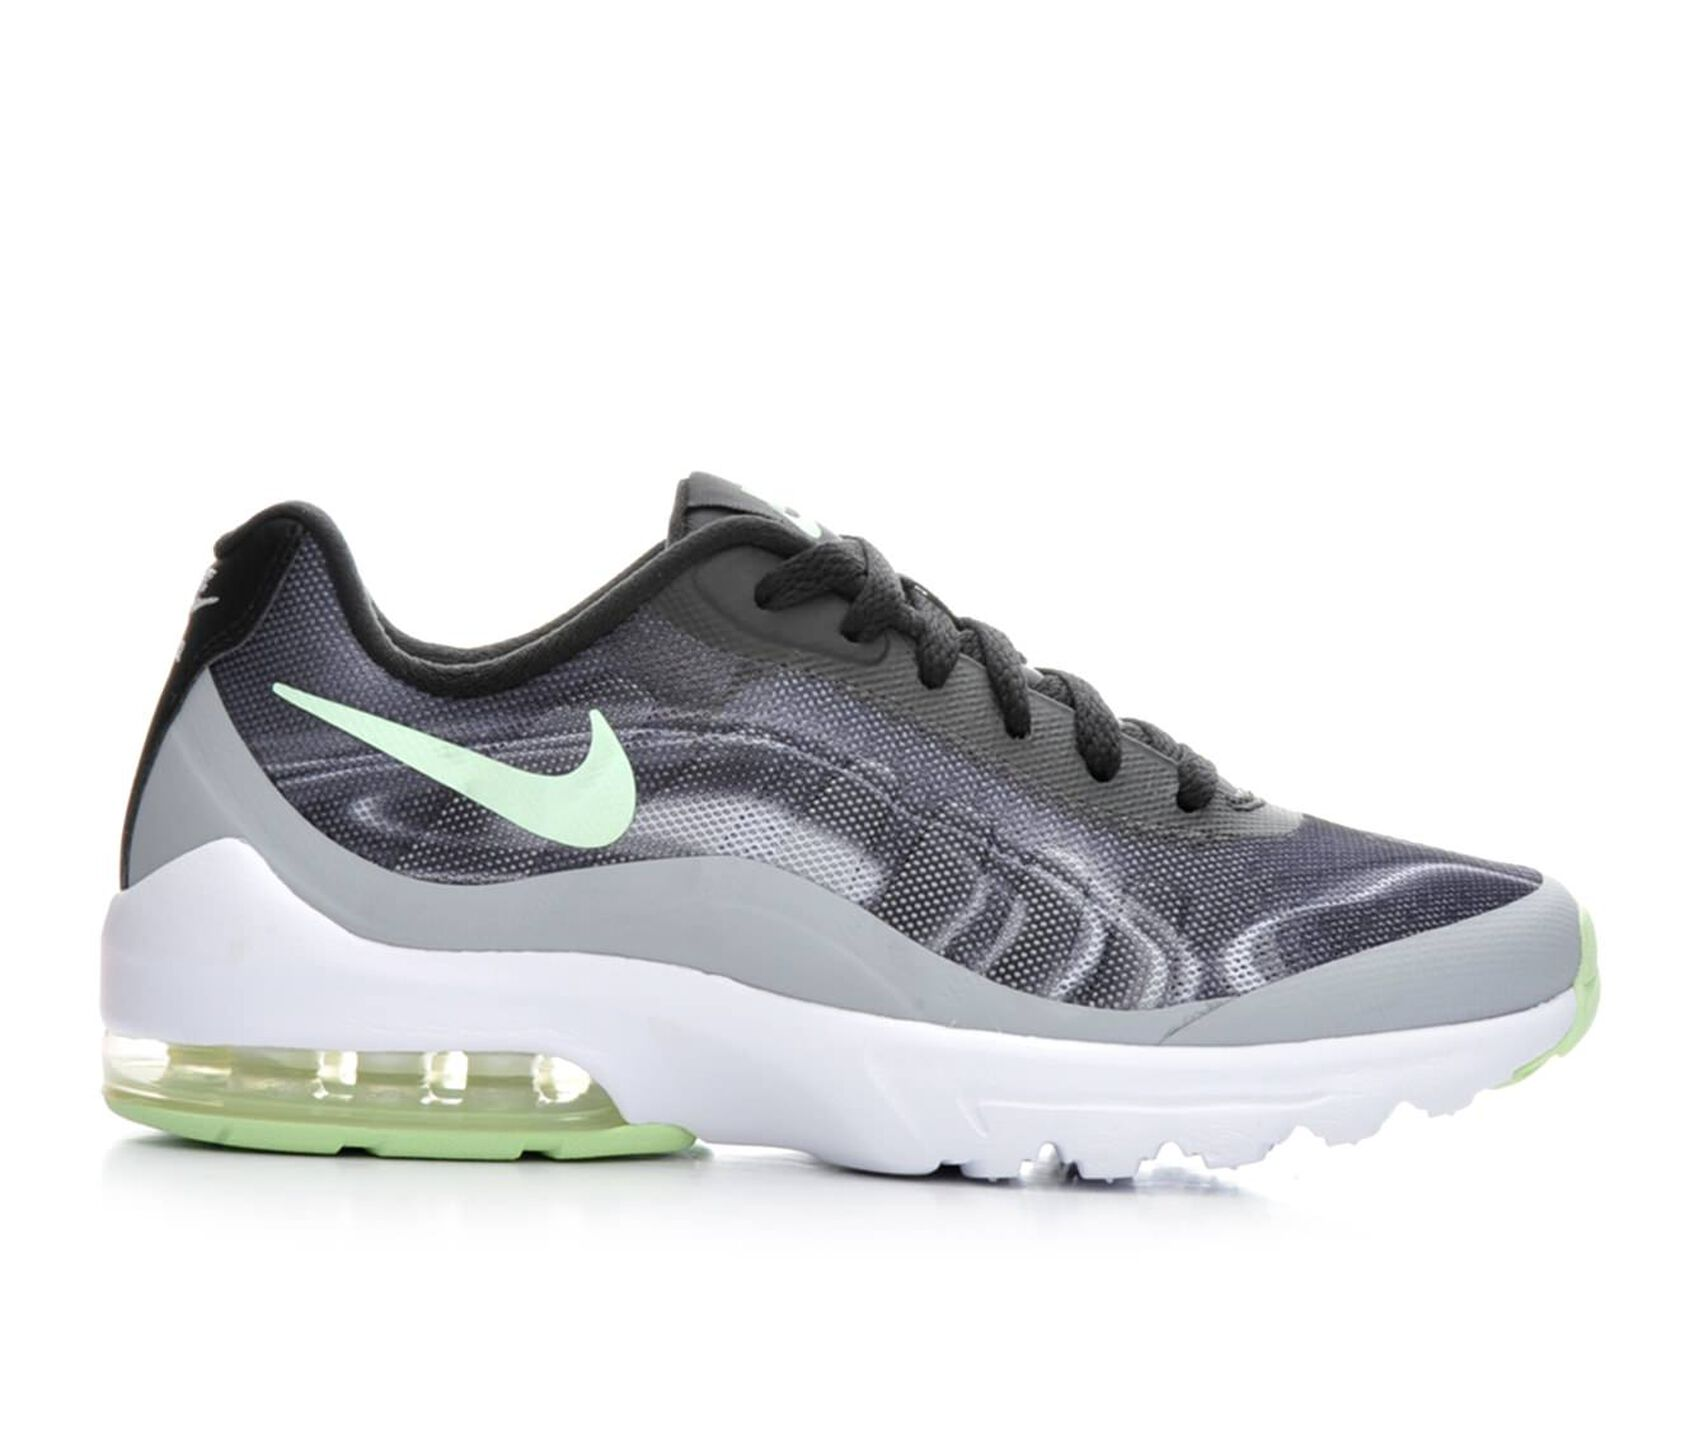 promo code 32563 1f9f2 ... Green Womens Nike Air Max Invigor Print Athletic Sneakers ...